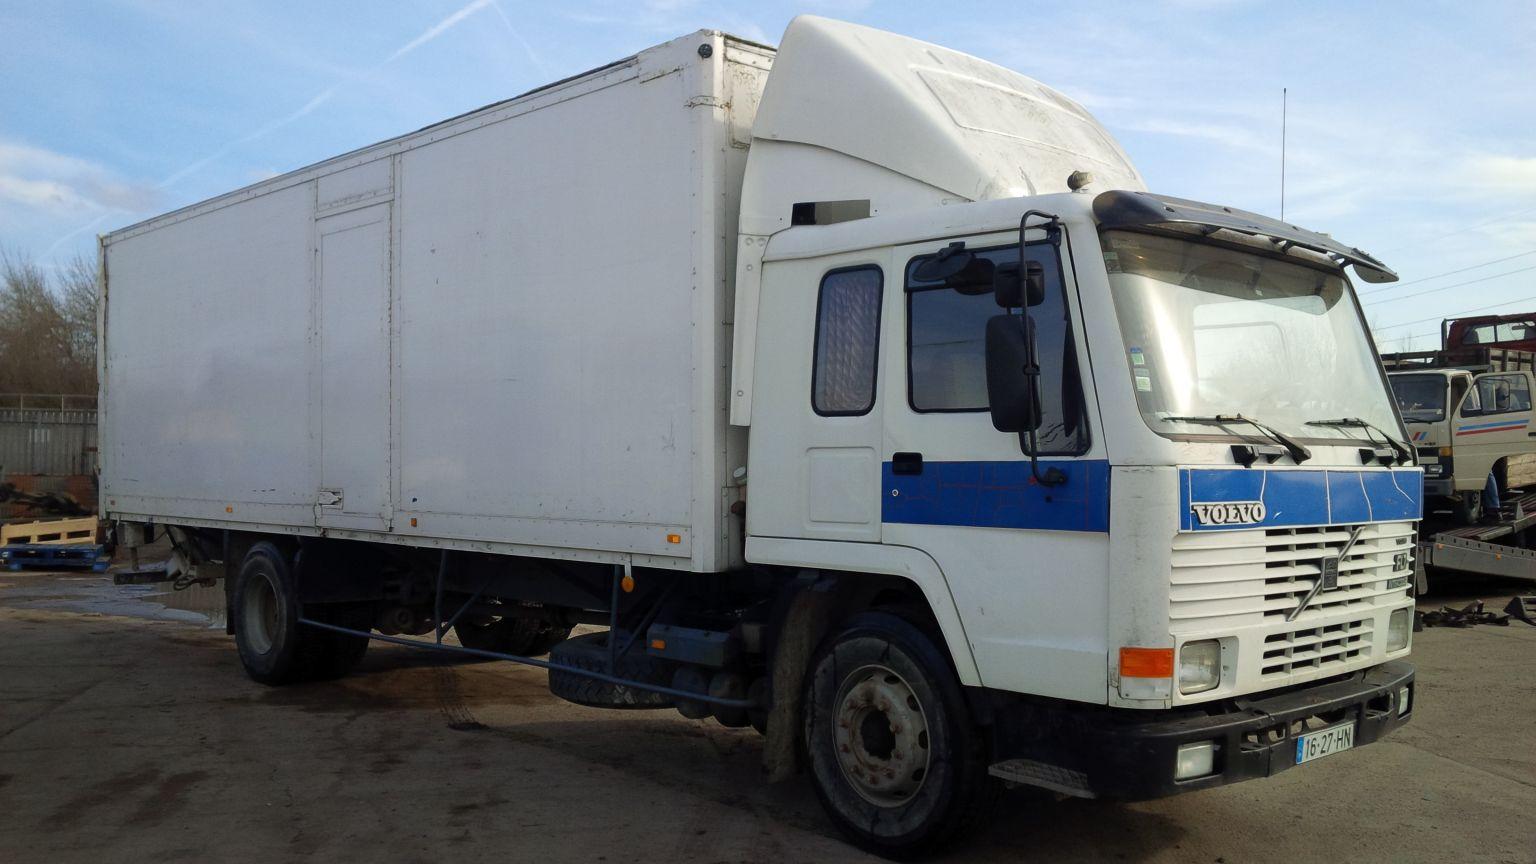 LHD Volvo box lorry.